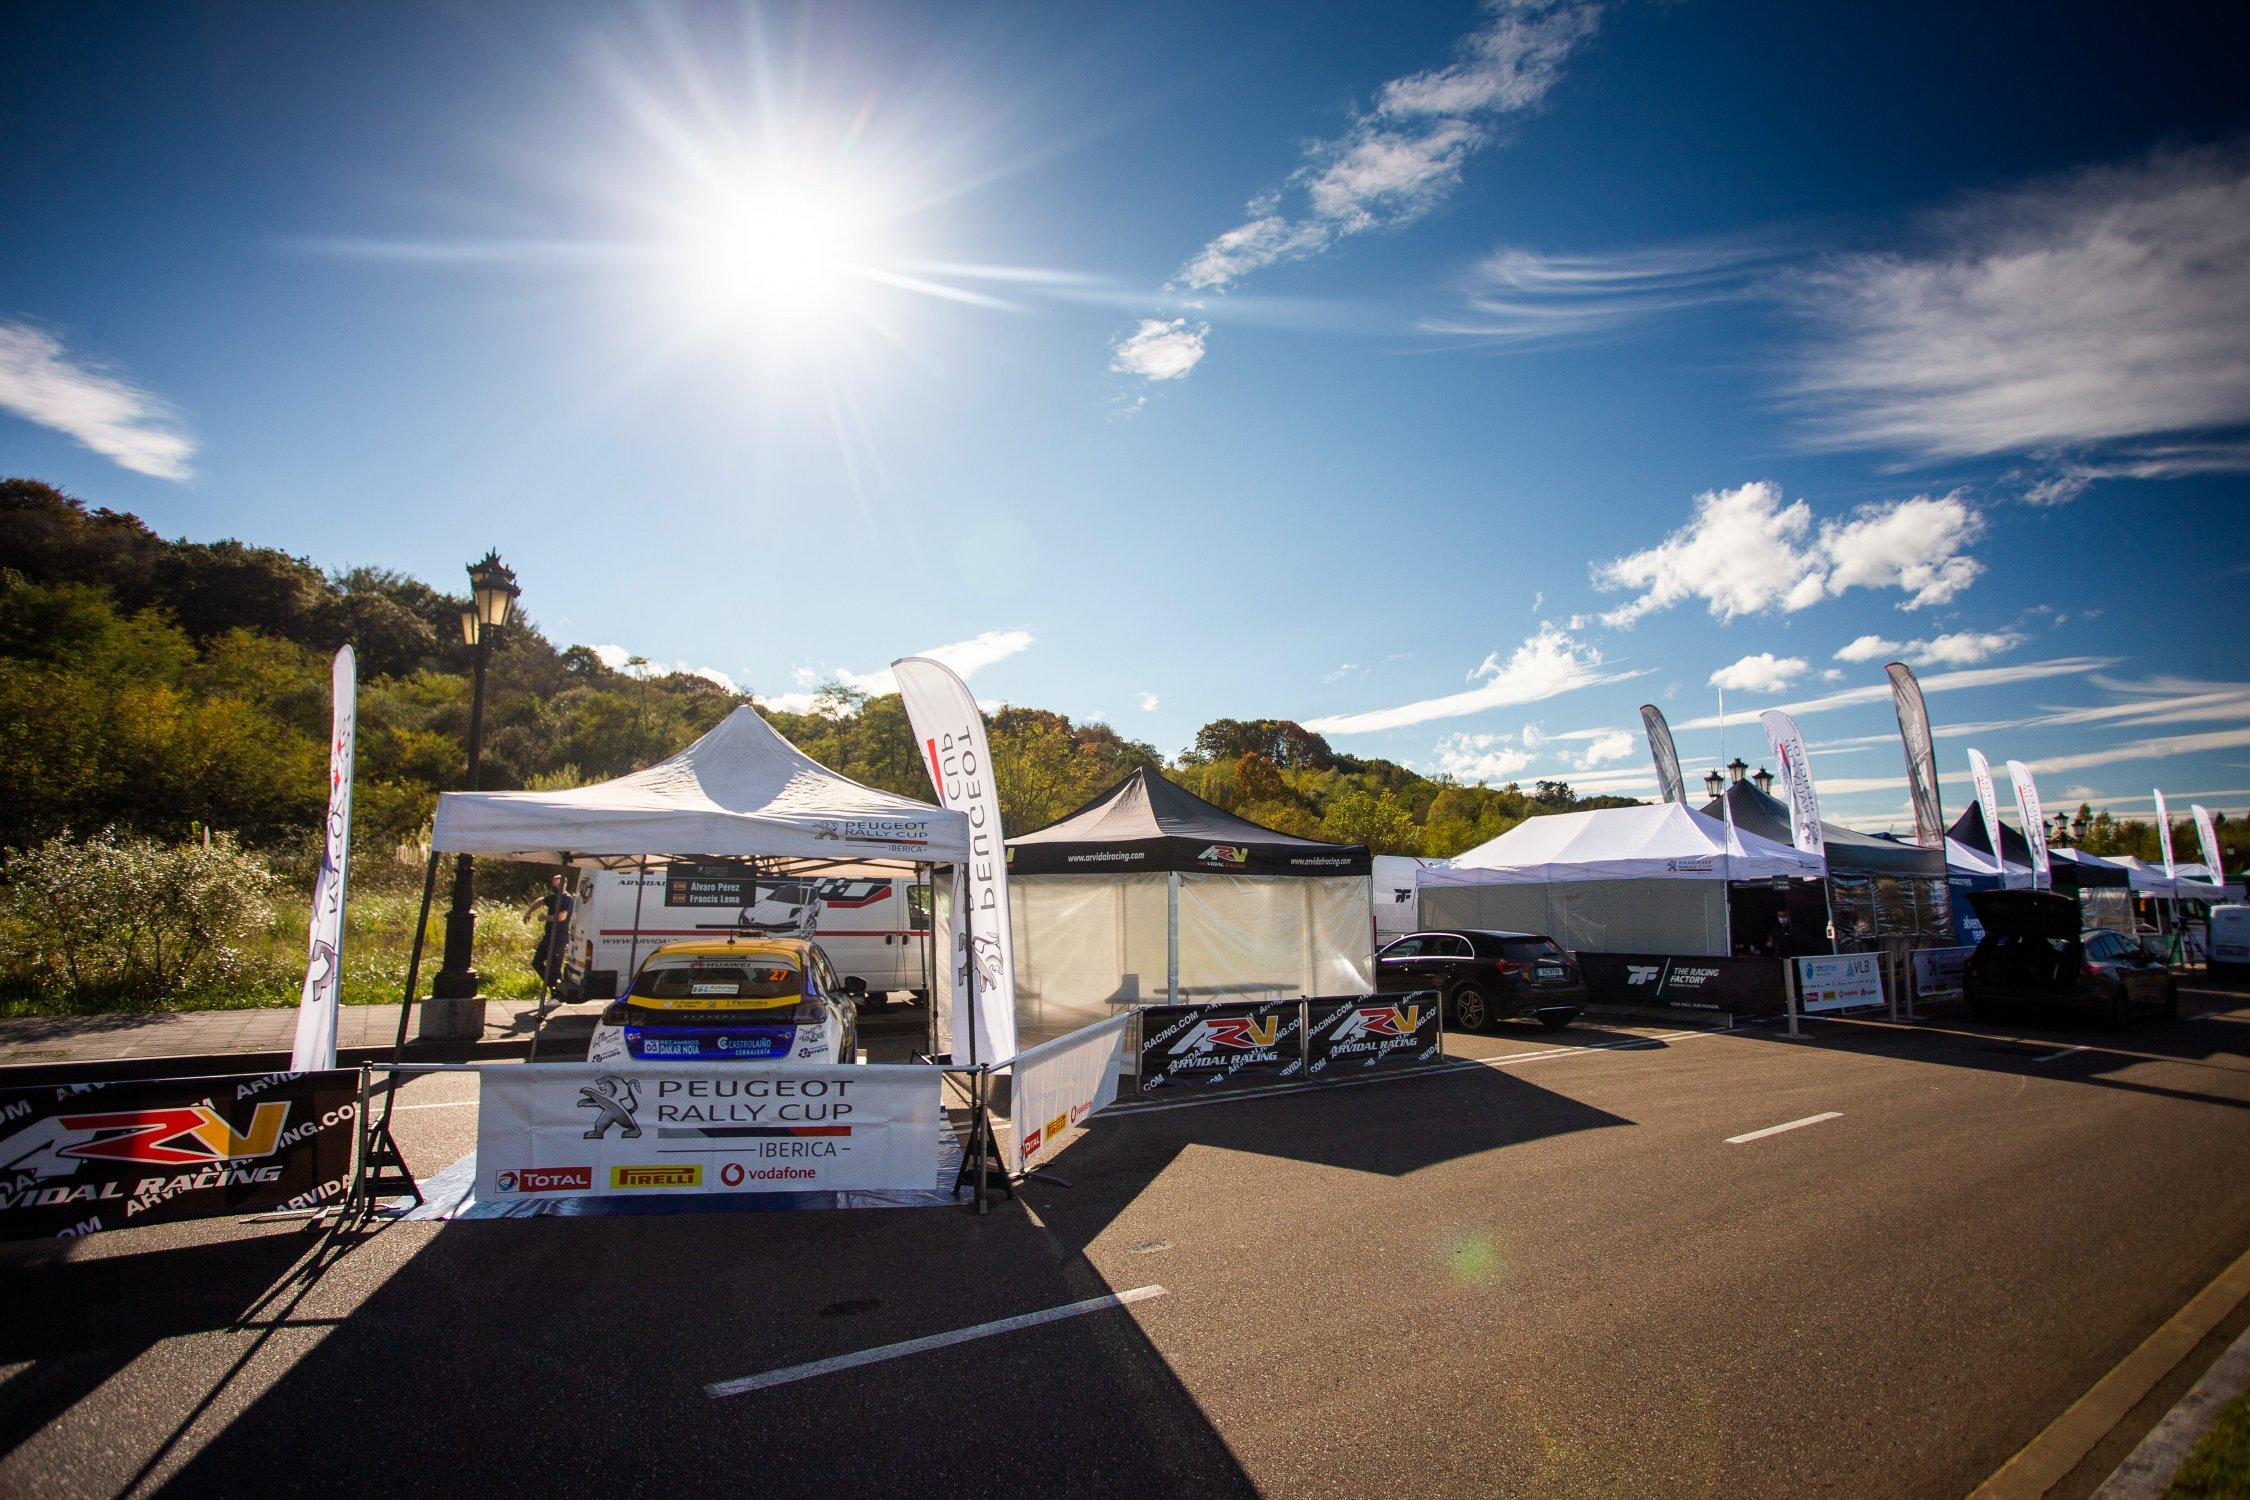 CERA + ERT: 57º Rallye Princesa de Asturias - Ciudad de Oviedo [23-24 Octubre] - Página 3 ElGIV2TXIAE9EY1?format=jpg&name=4096x4096